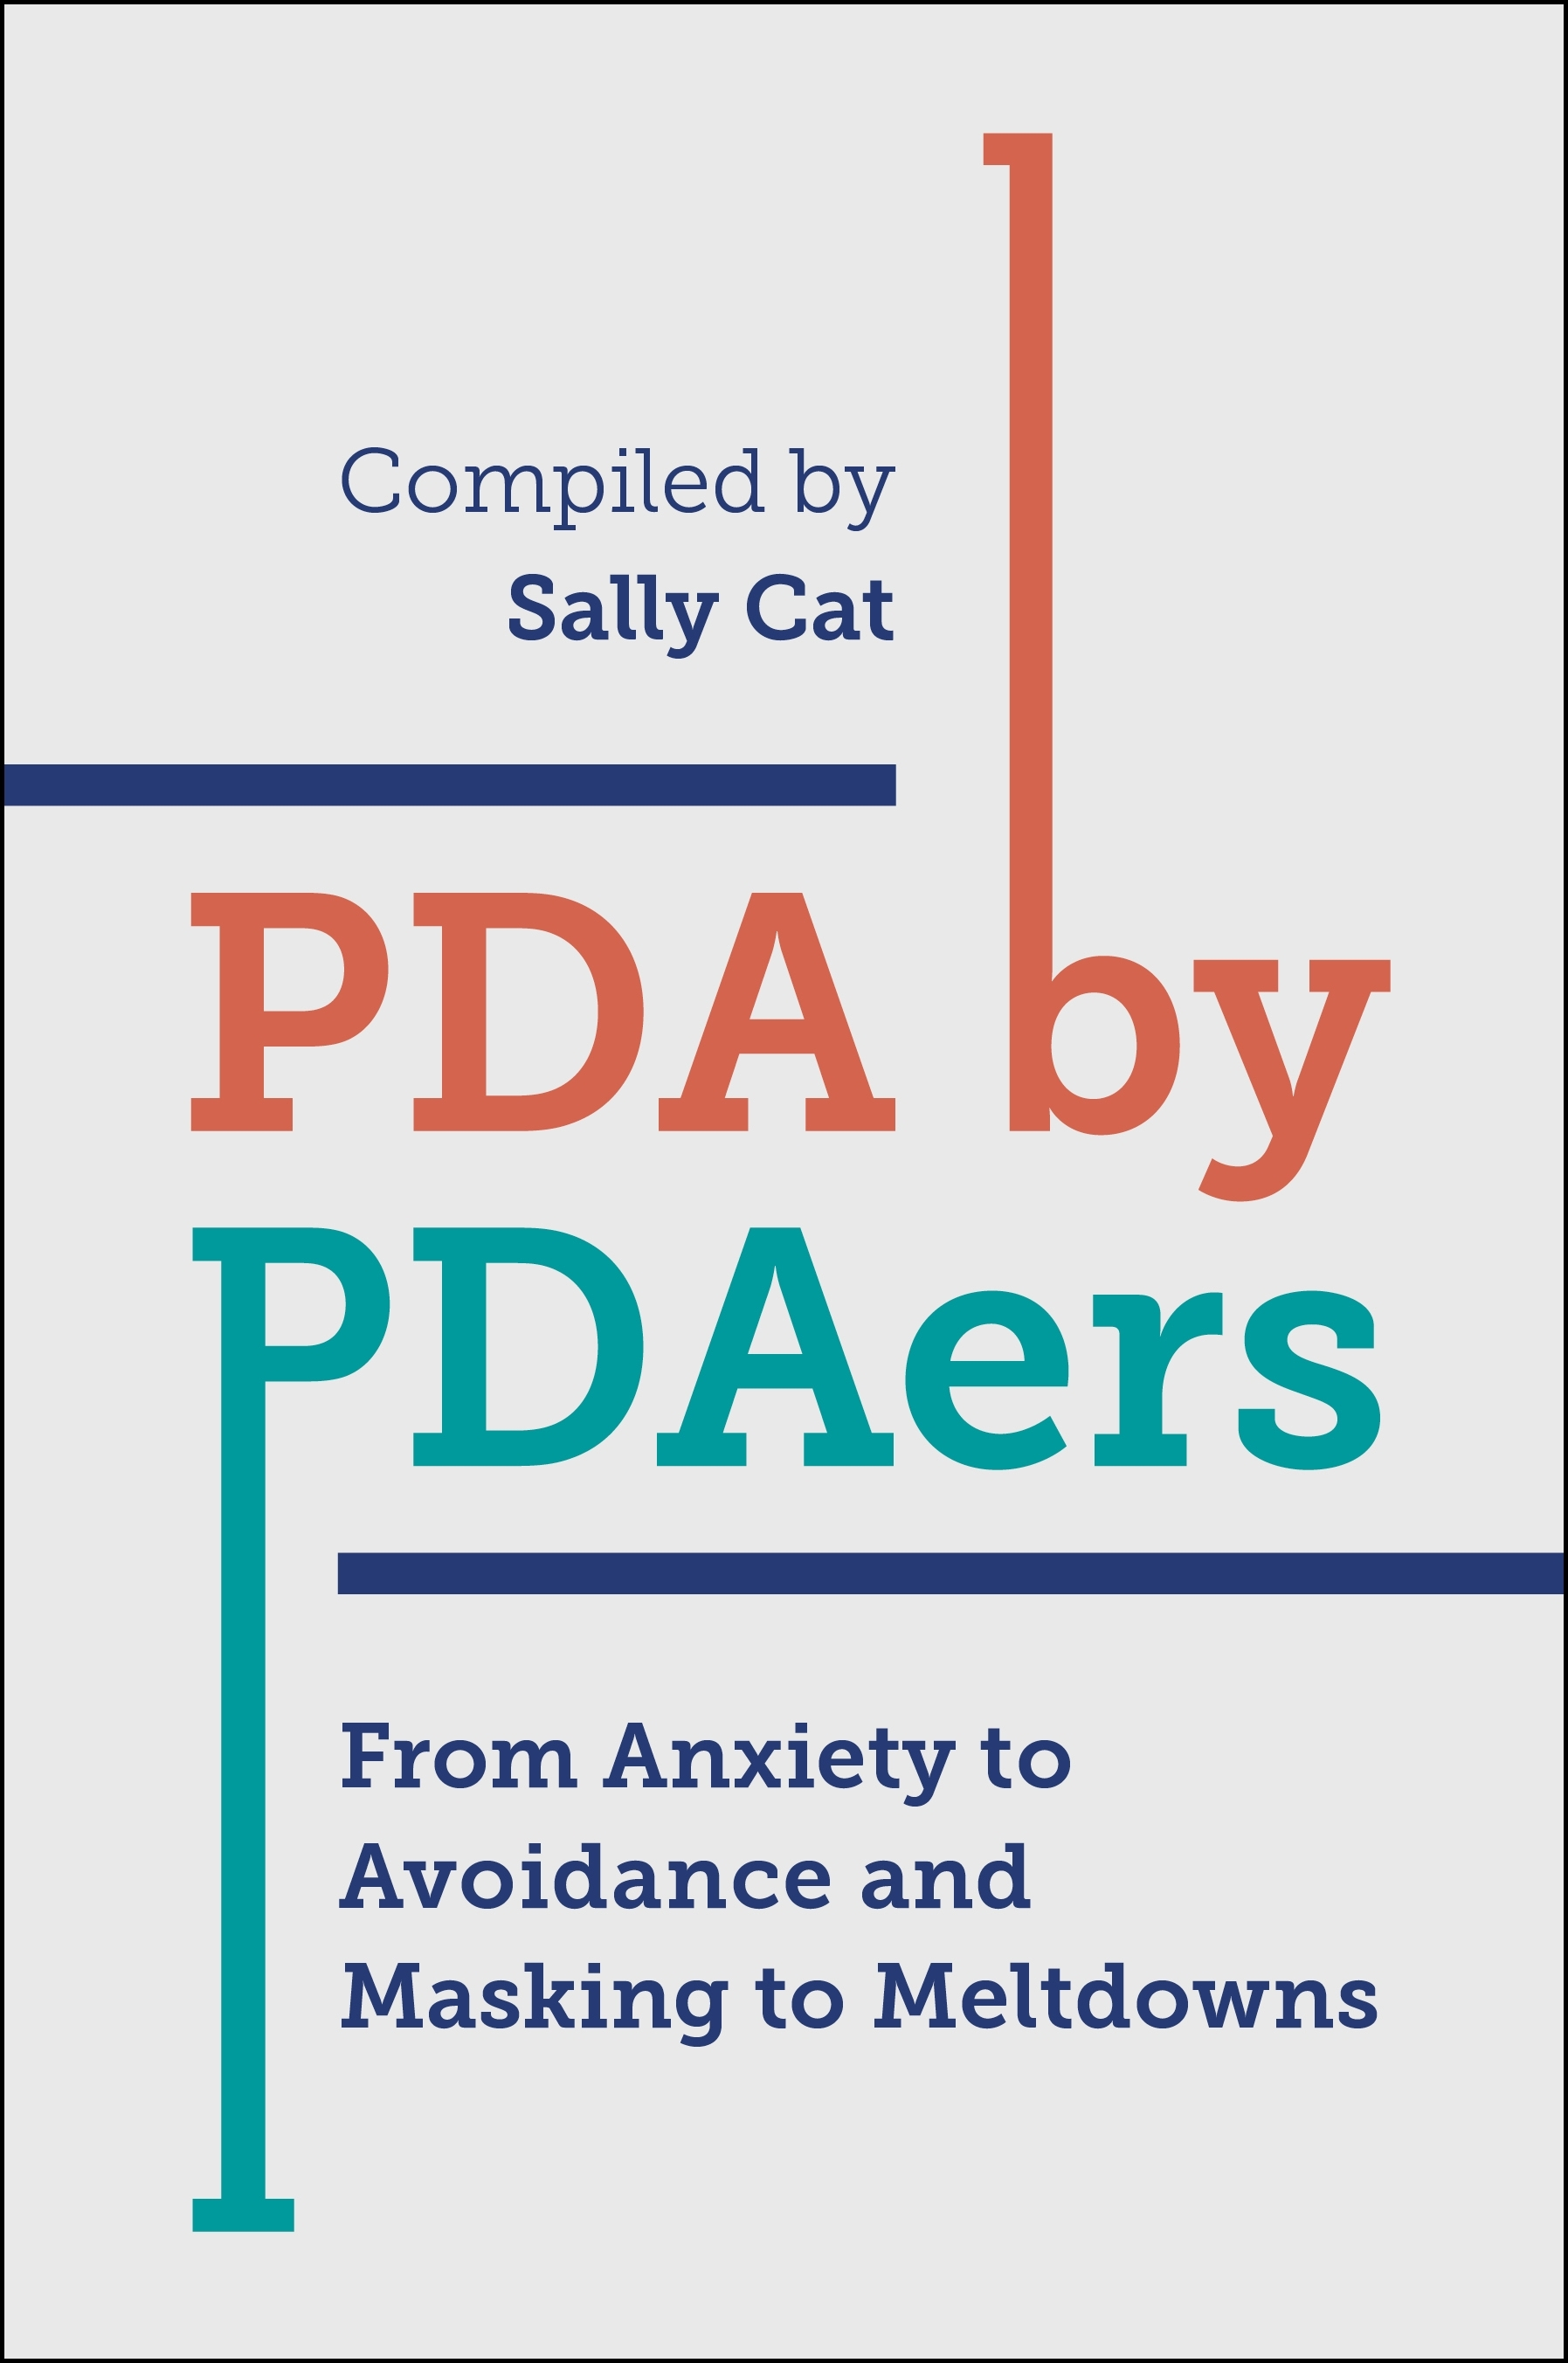 PDA day